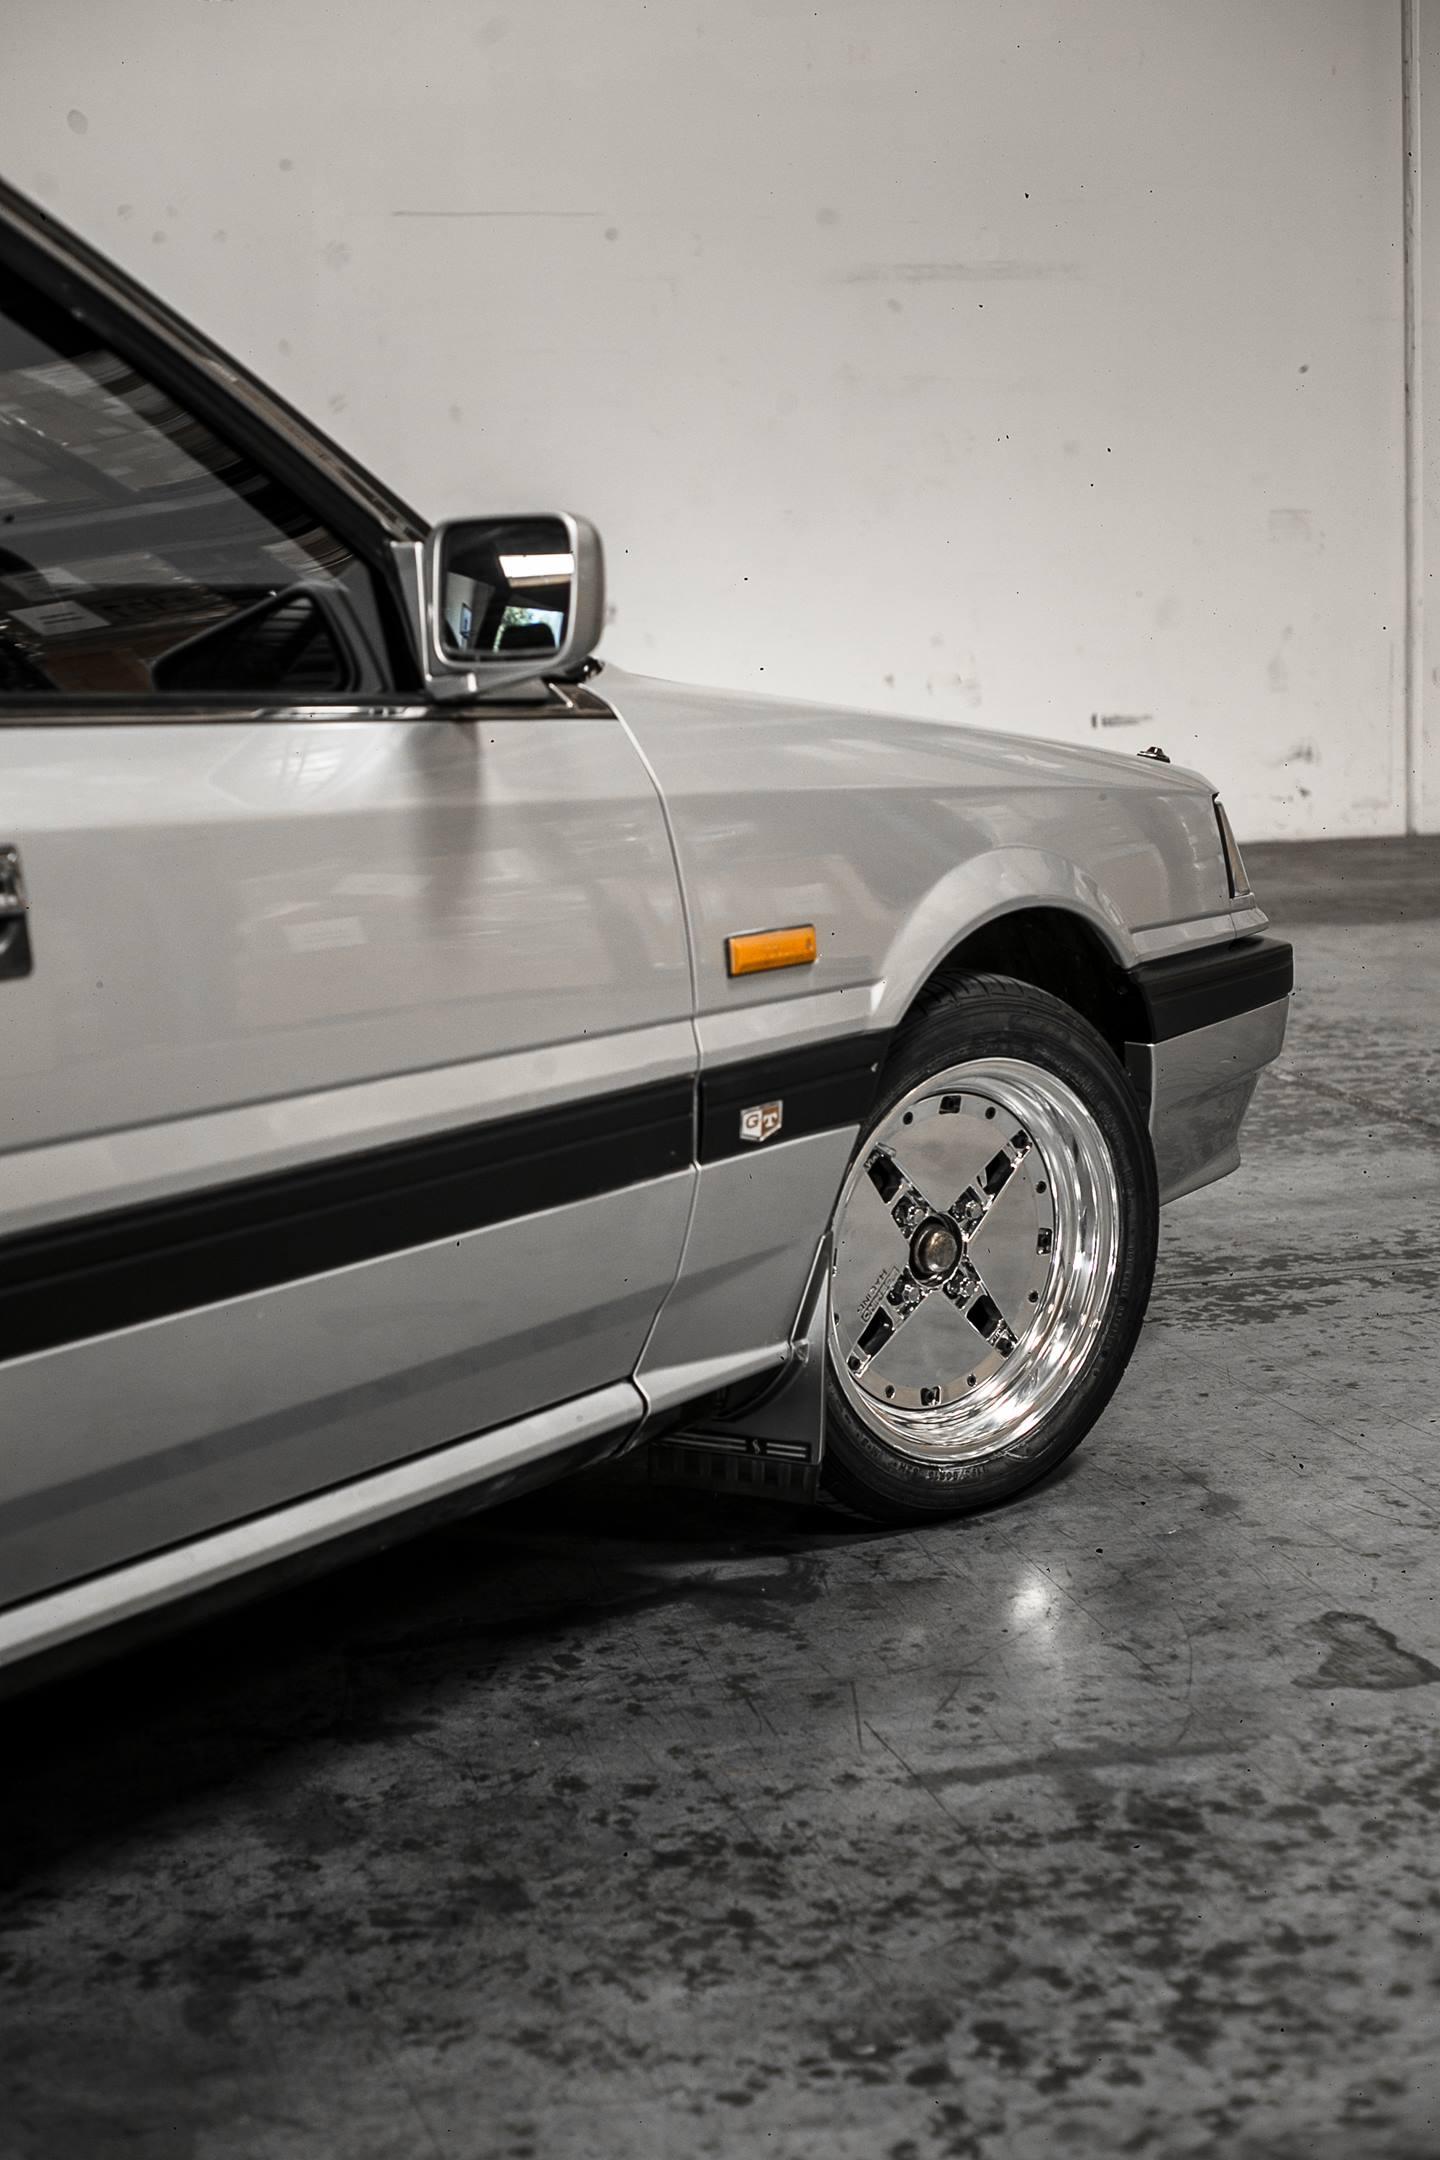 Nissan R31 Skyline turbo wagon side detail